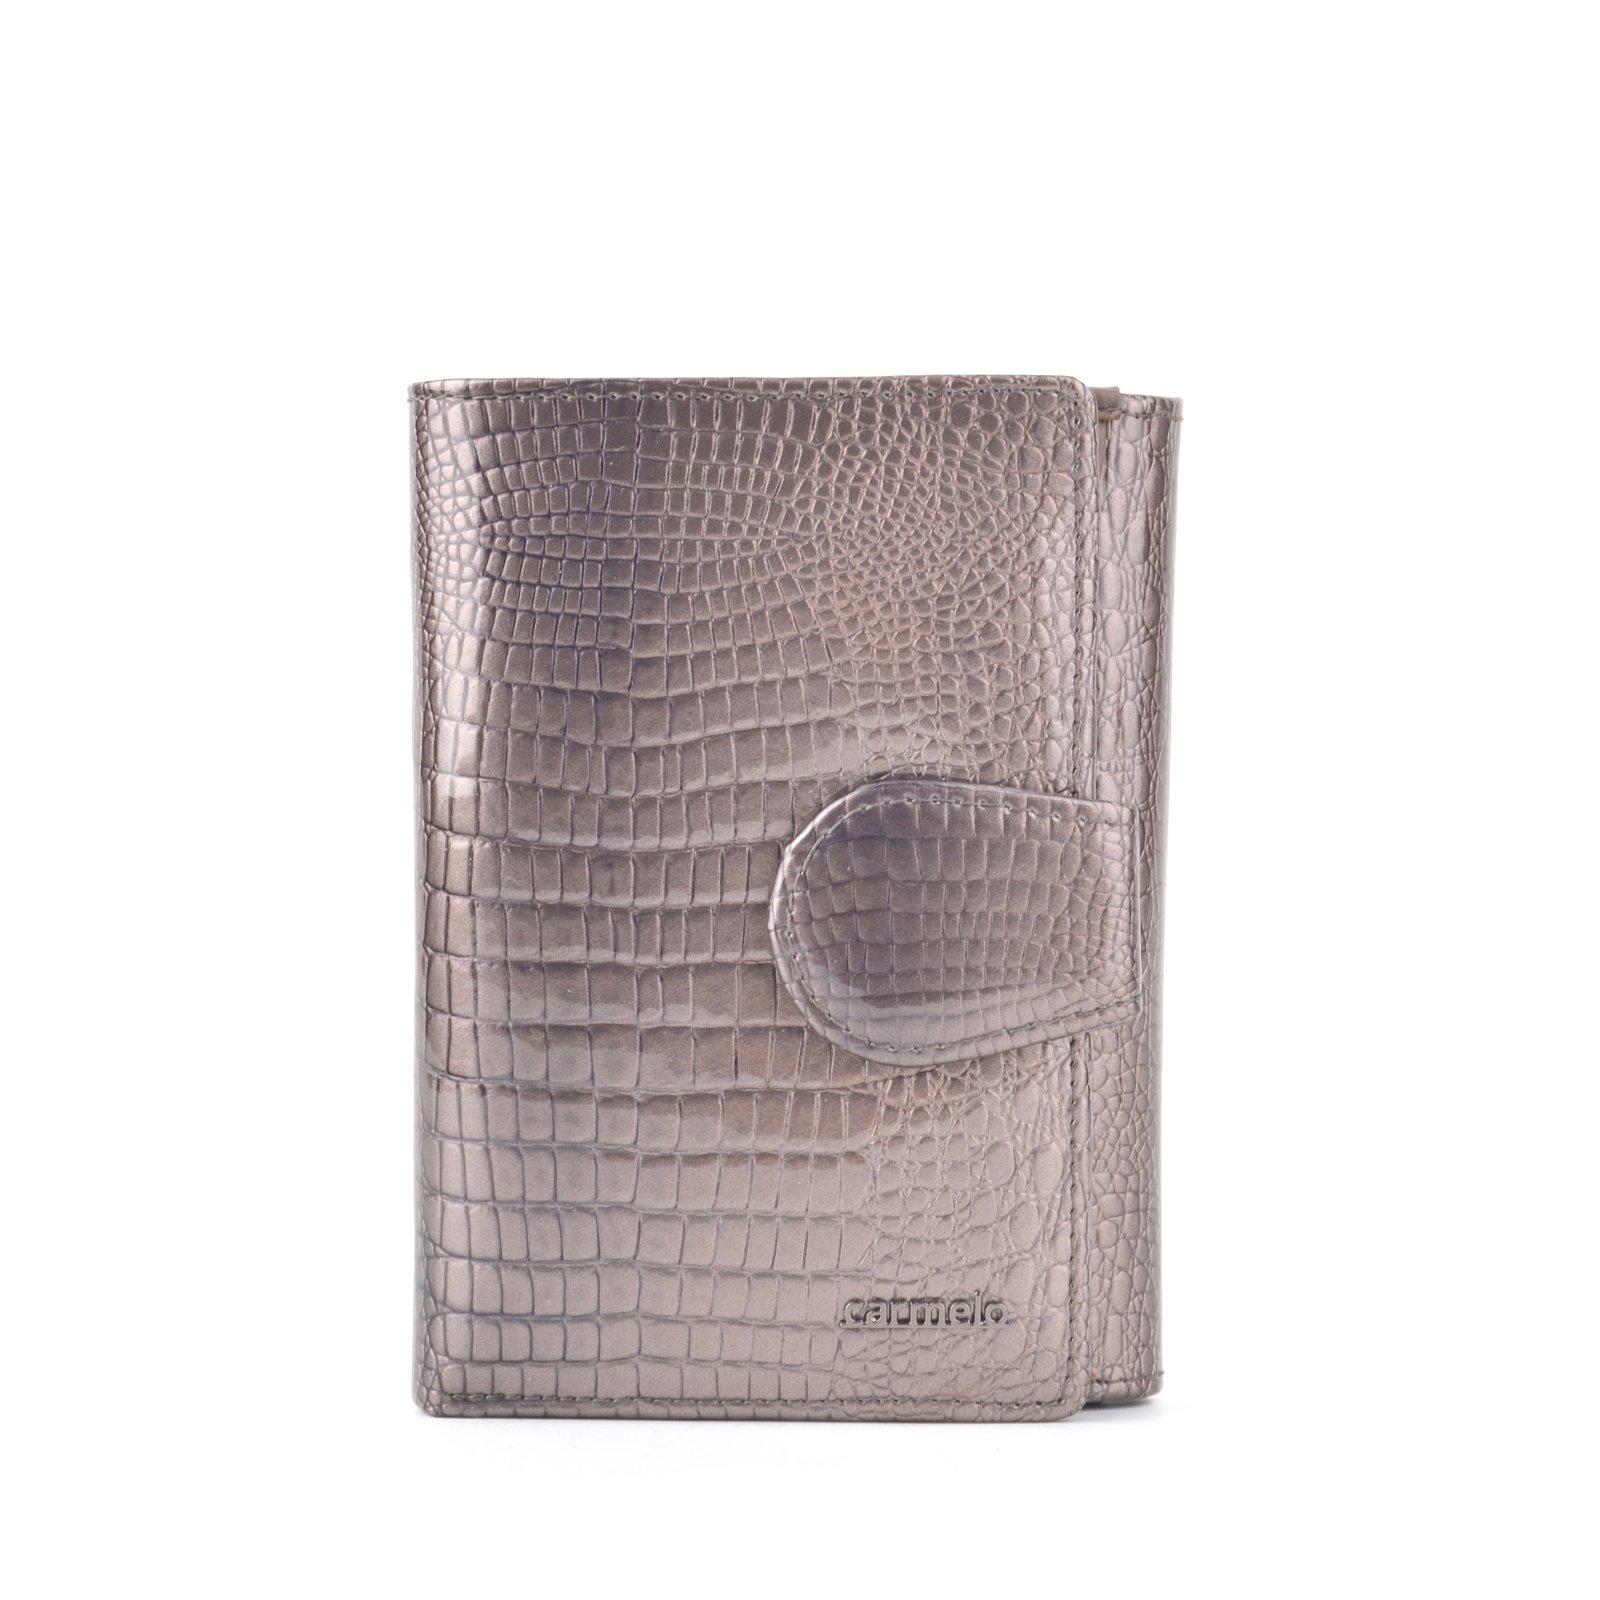 Kožená peněženka Carmelo – 2108 A S